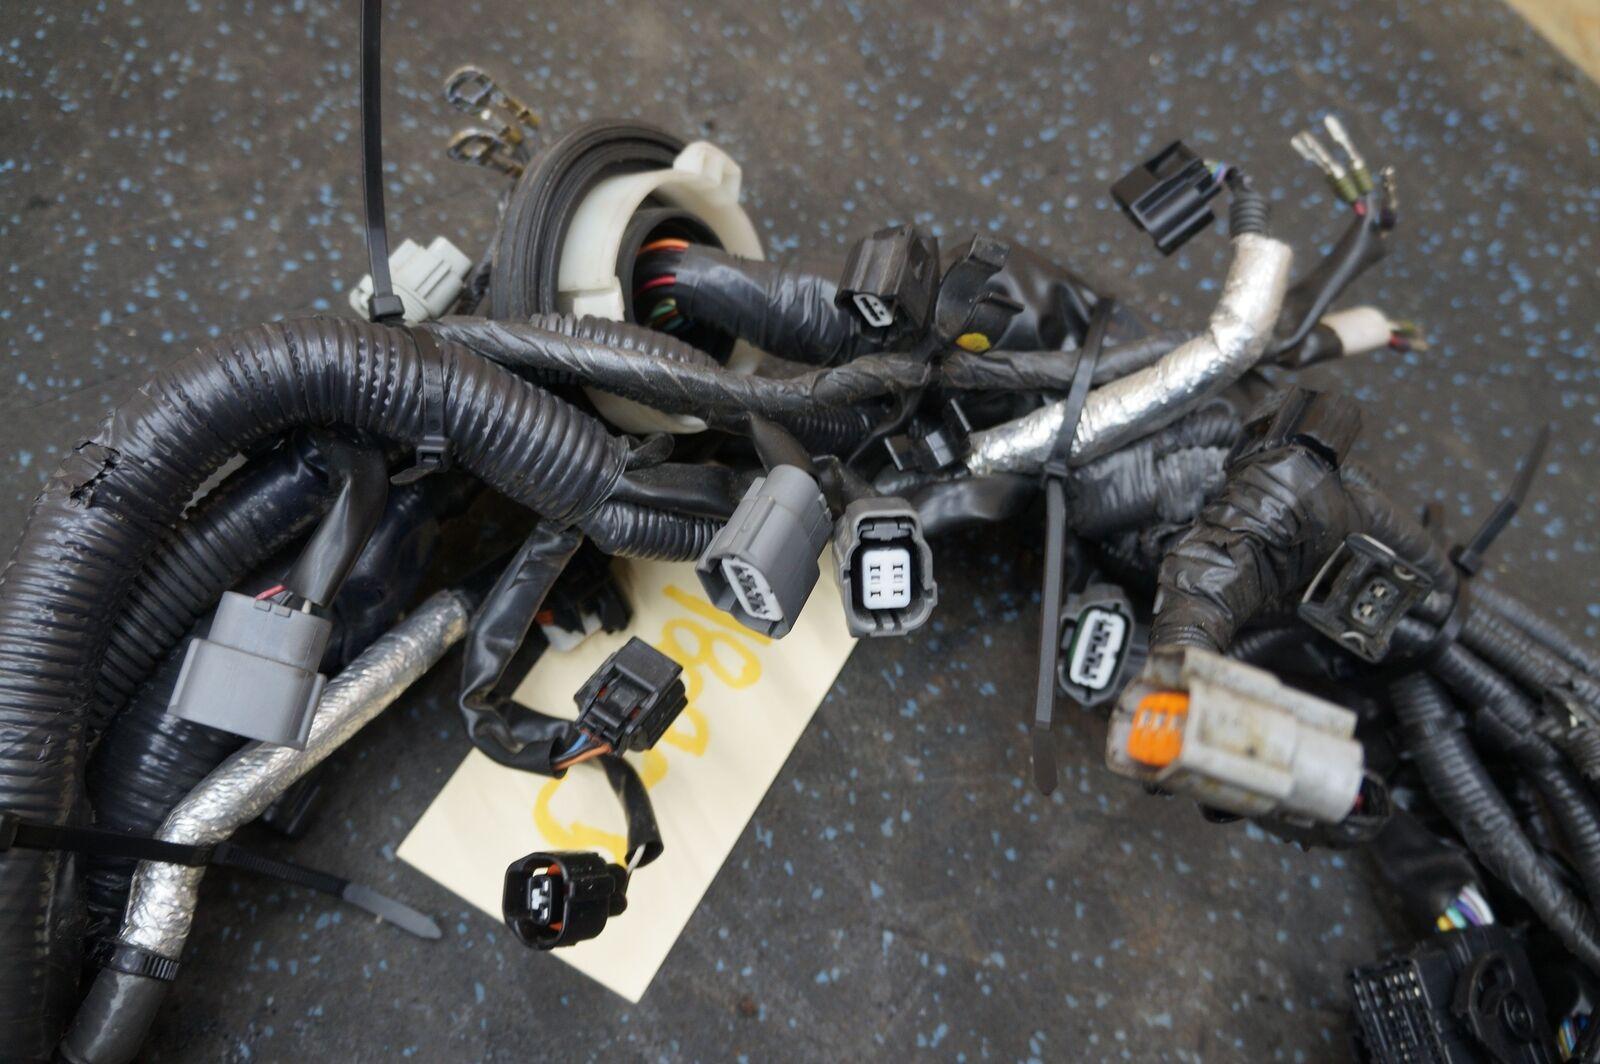 Engine Wire Wiring Harness Vr38dett 24012jf50a Oem Nissan Gtr R35